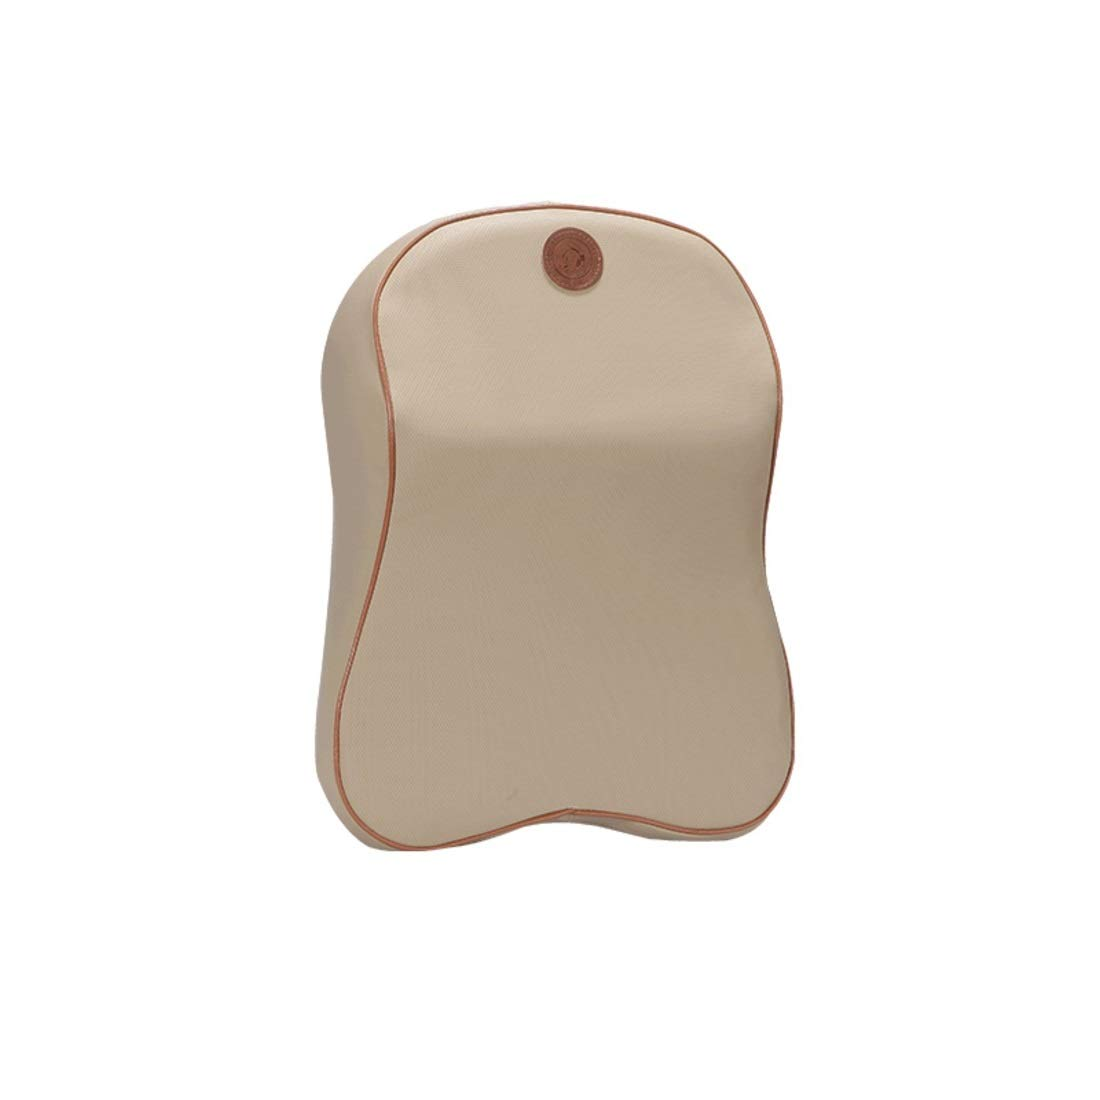 XIAMEND Leather Material Car Pillow Lumbar Memory Cotton Headrest Car Neck Pillow (Color : Beige) by XIAMEND